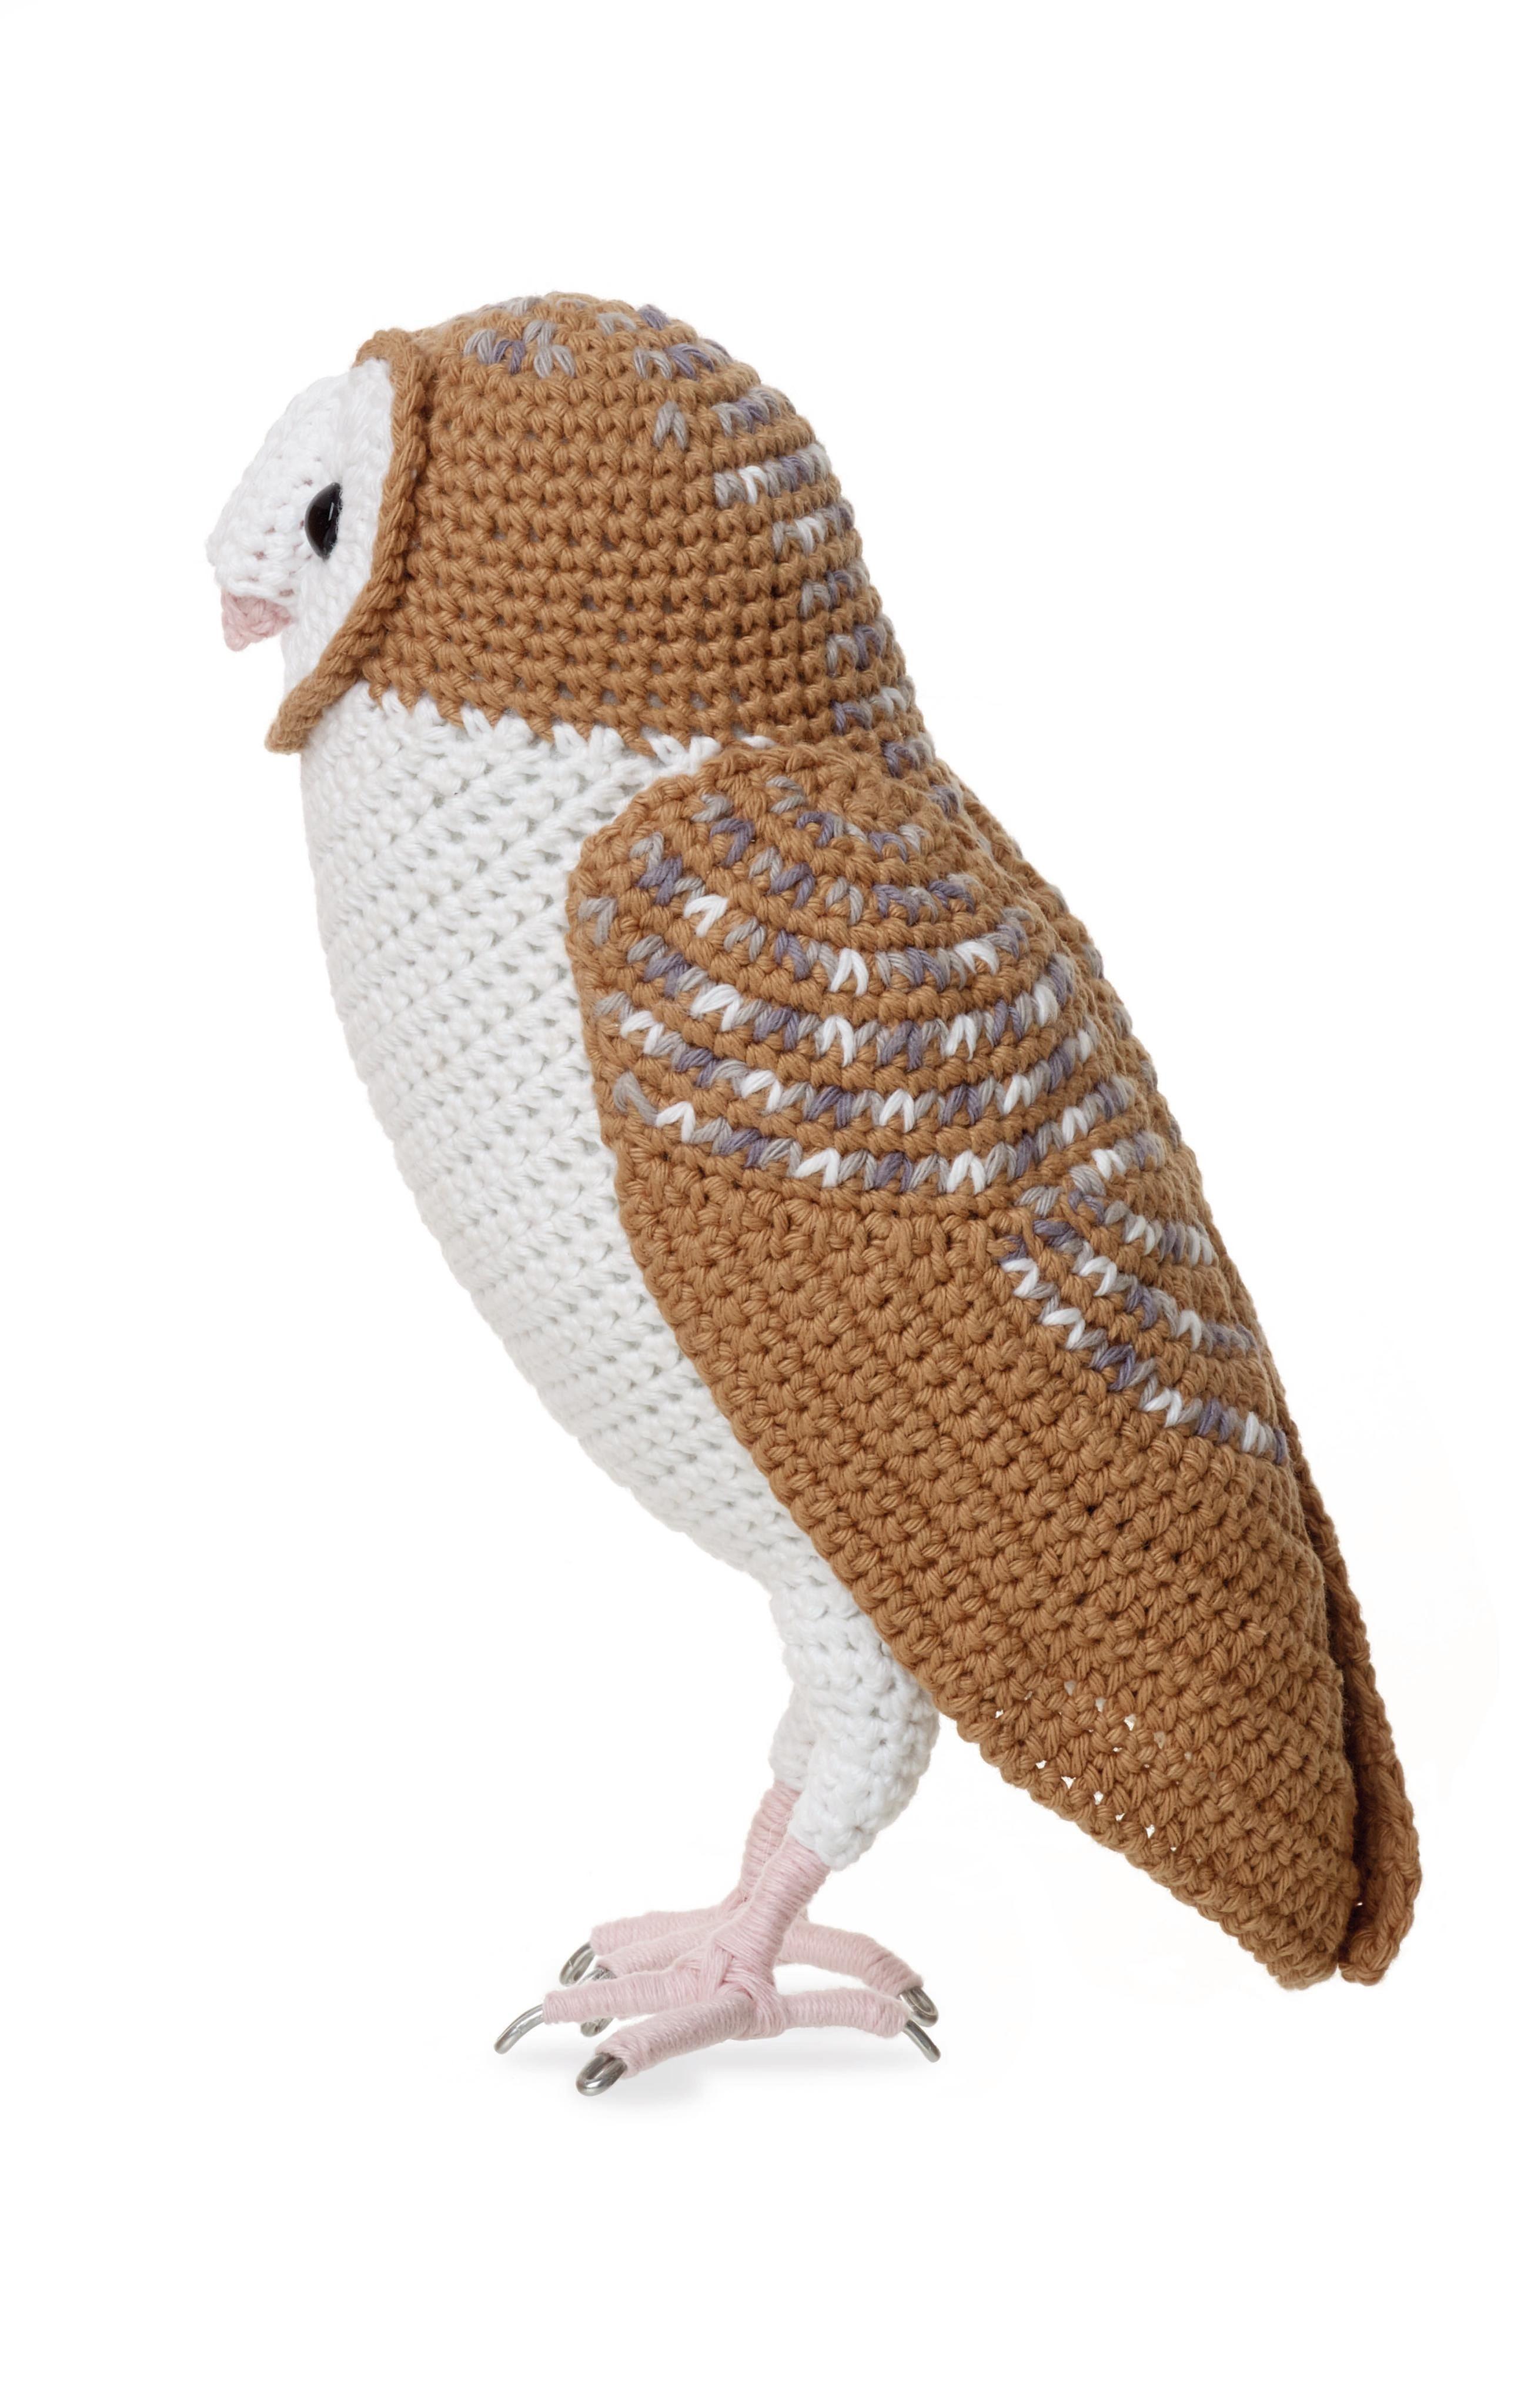 044 Amigurumi Rooster Pattern. Crochet rooster Gordey. Amigurumi ... | 4096x2592